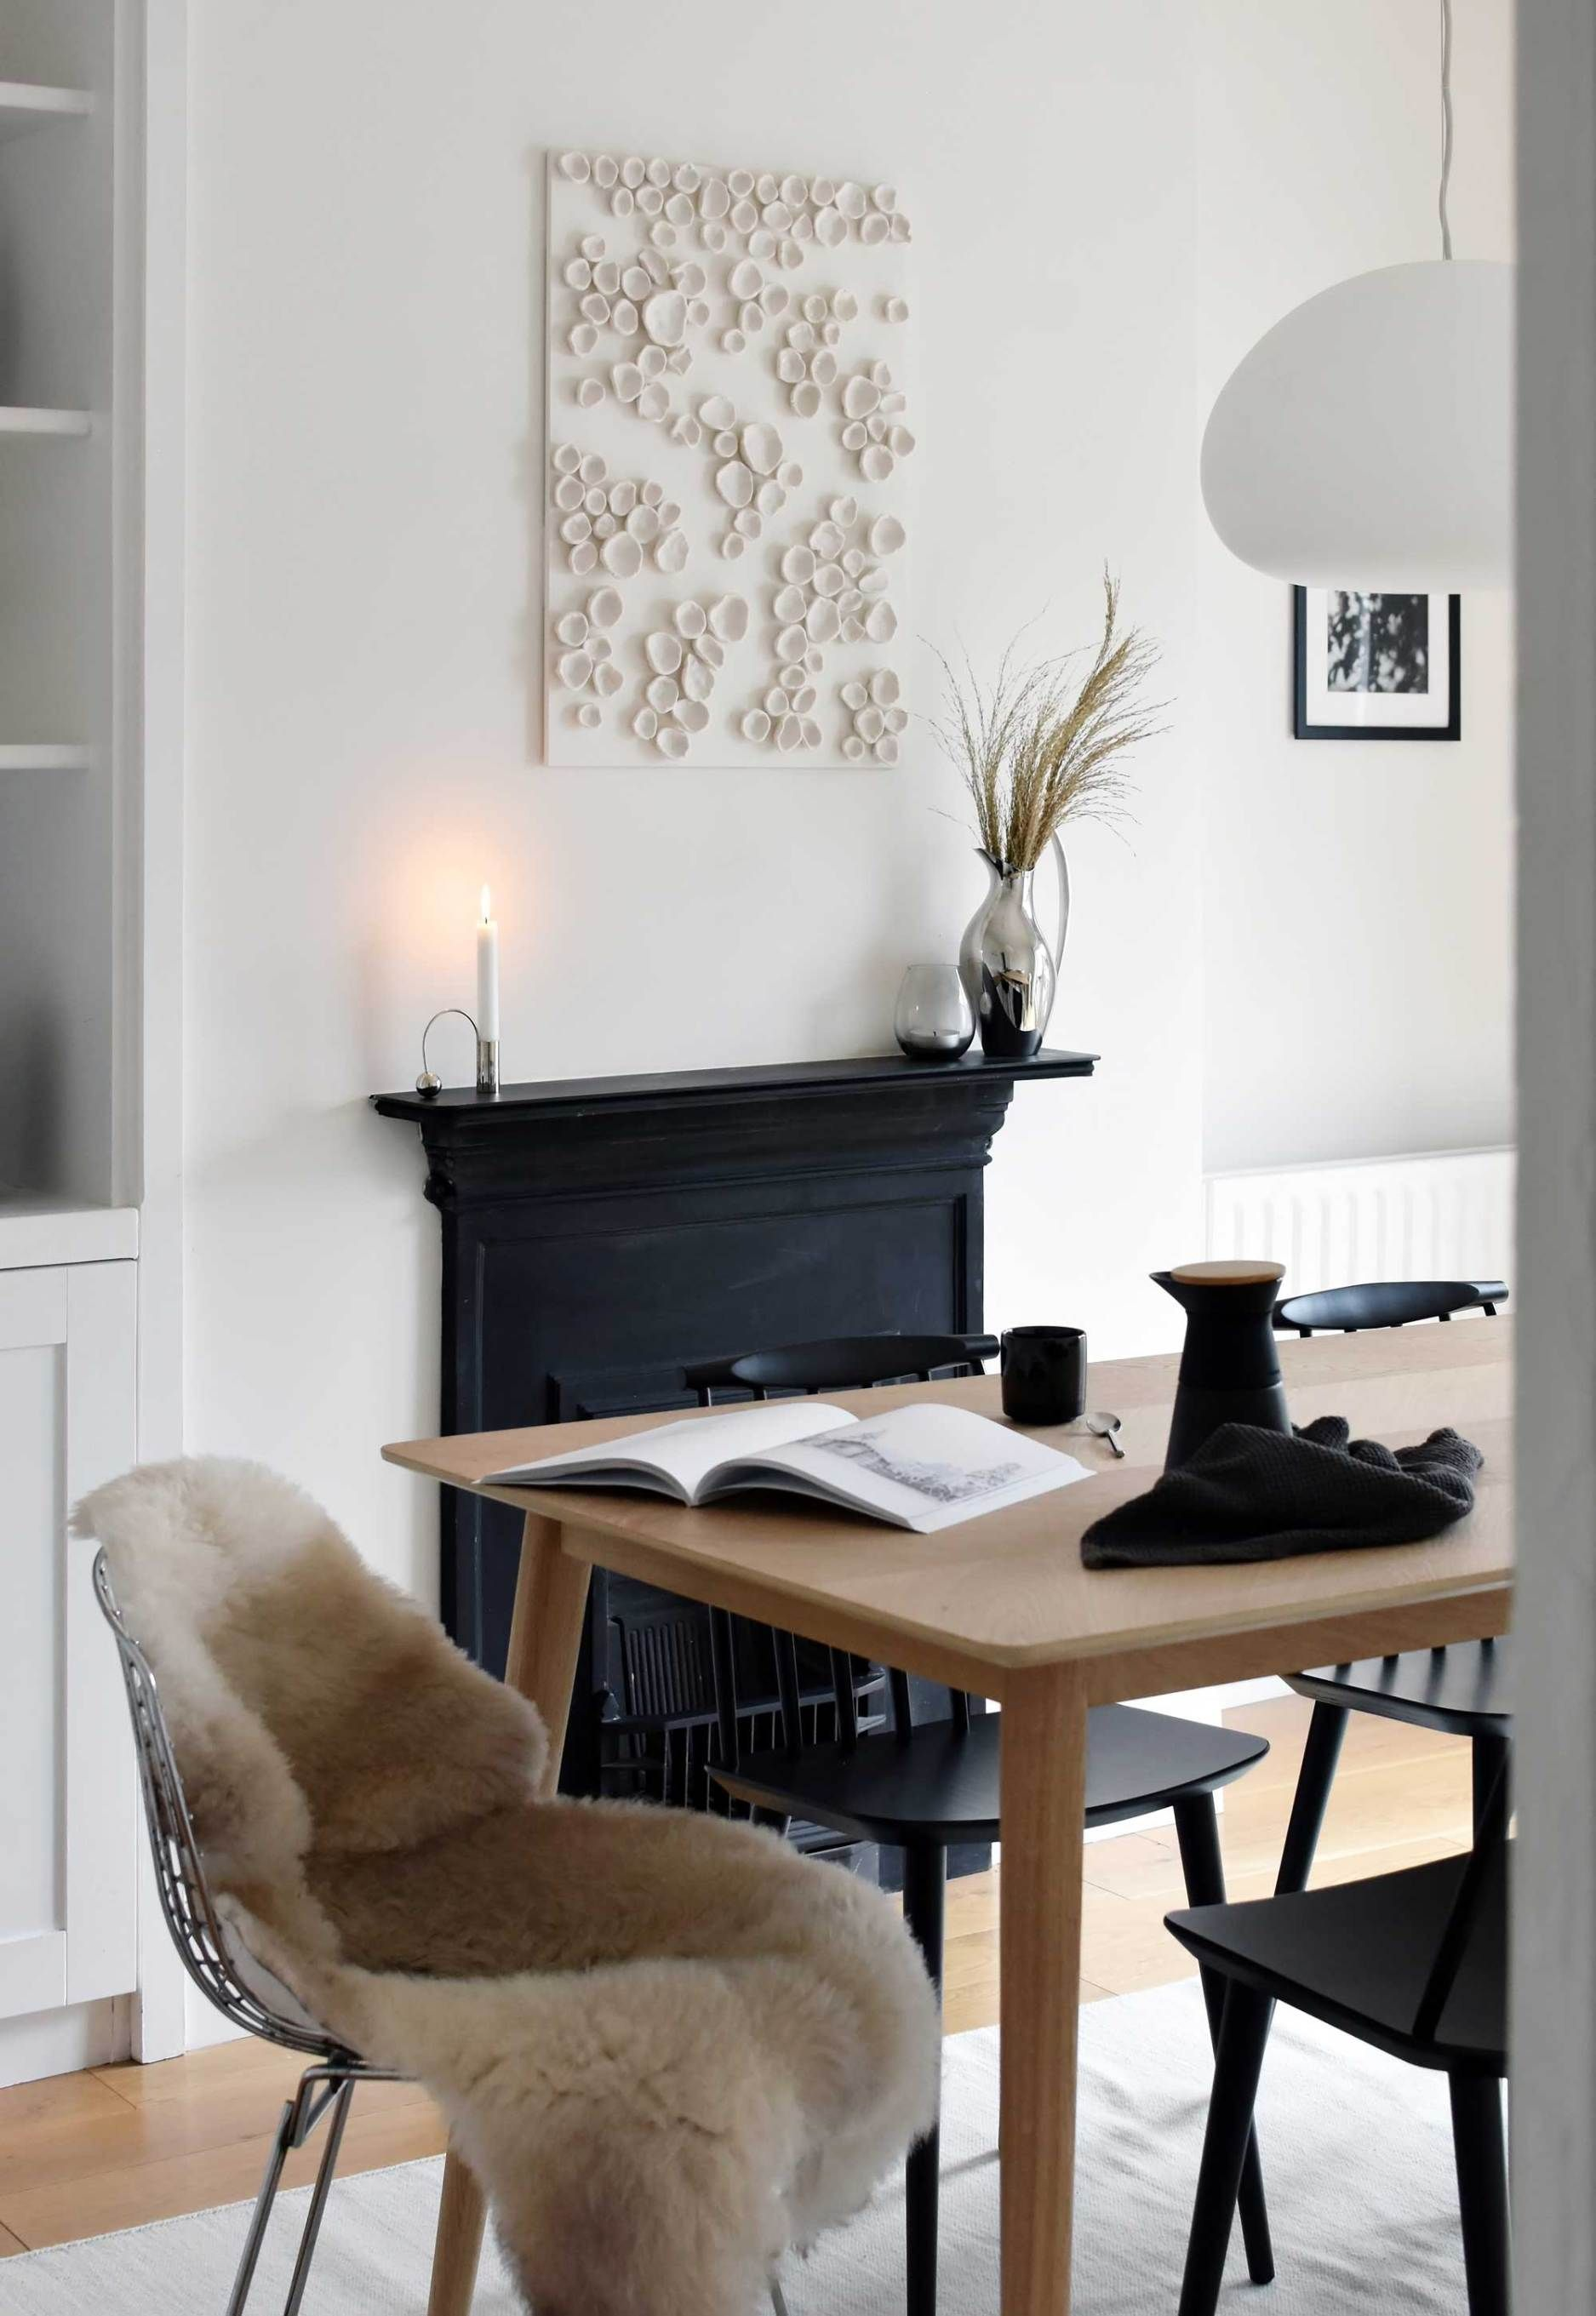 my minimalist yet warm dining room makeover d i n i n g u2039 u203a r rh pinterest com